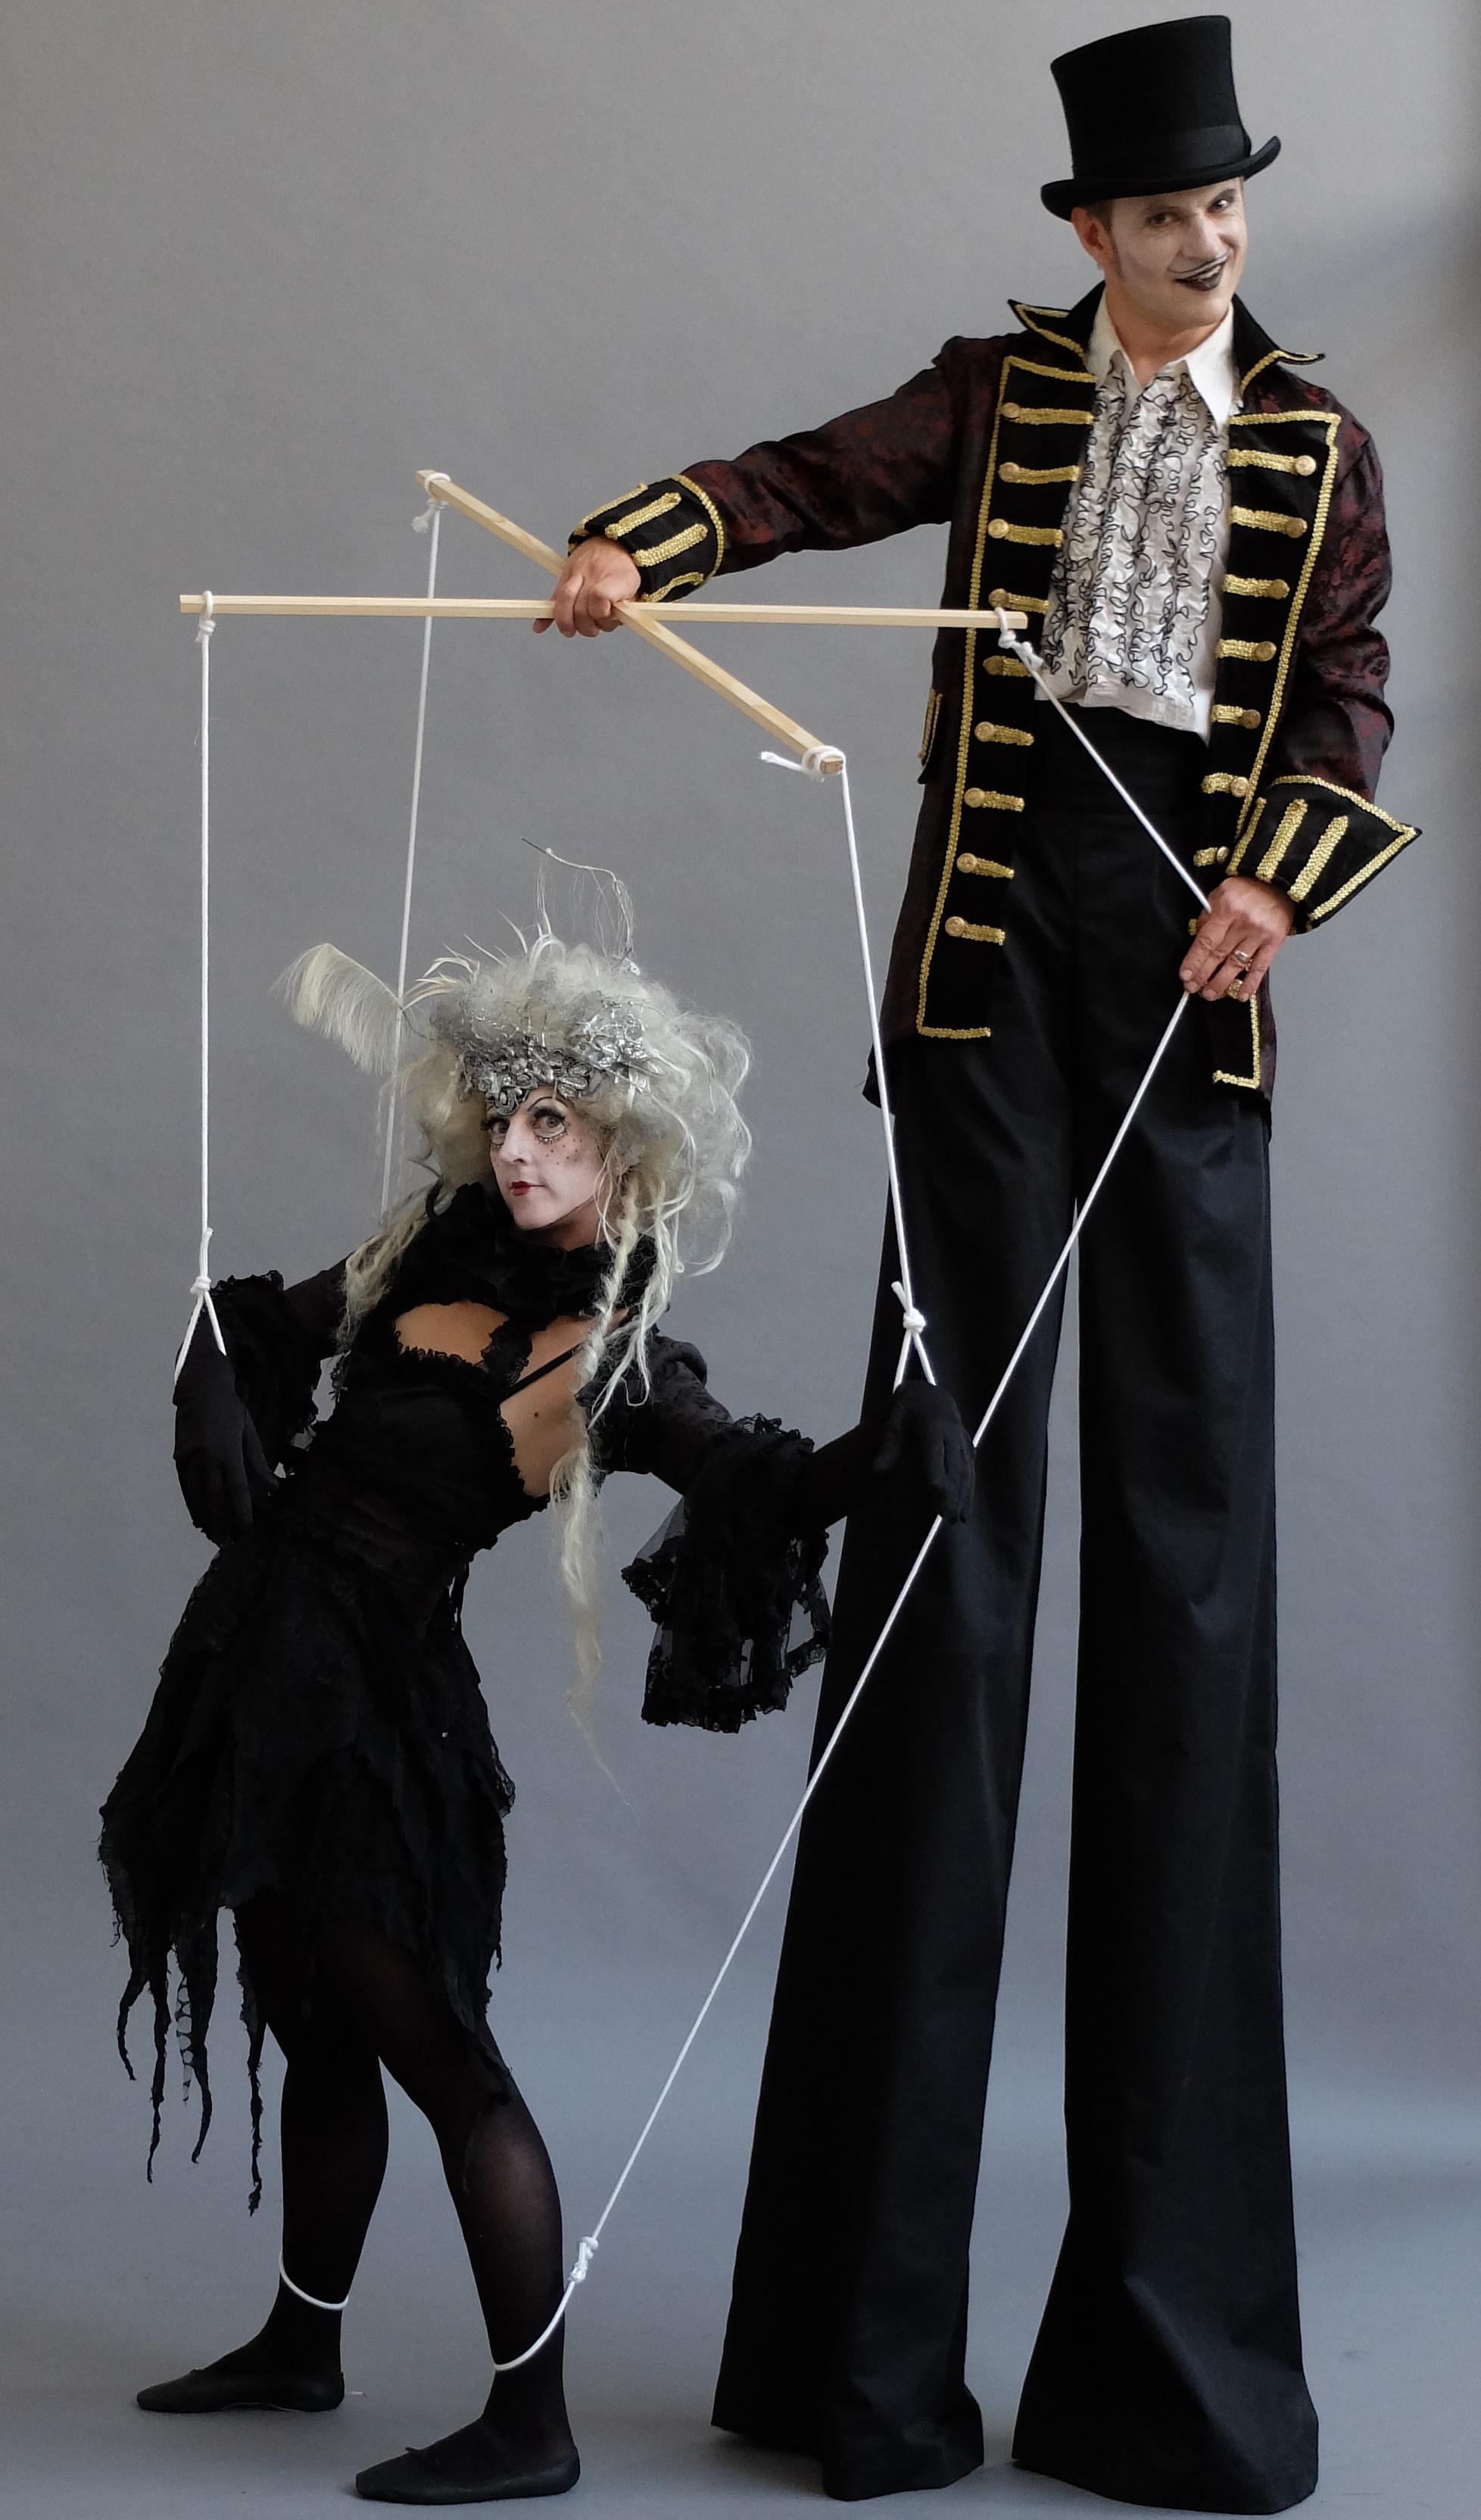 Halloween Marionette